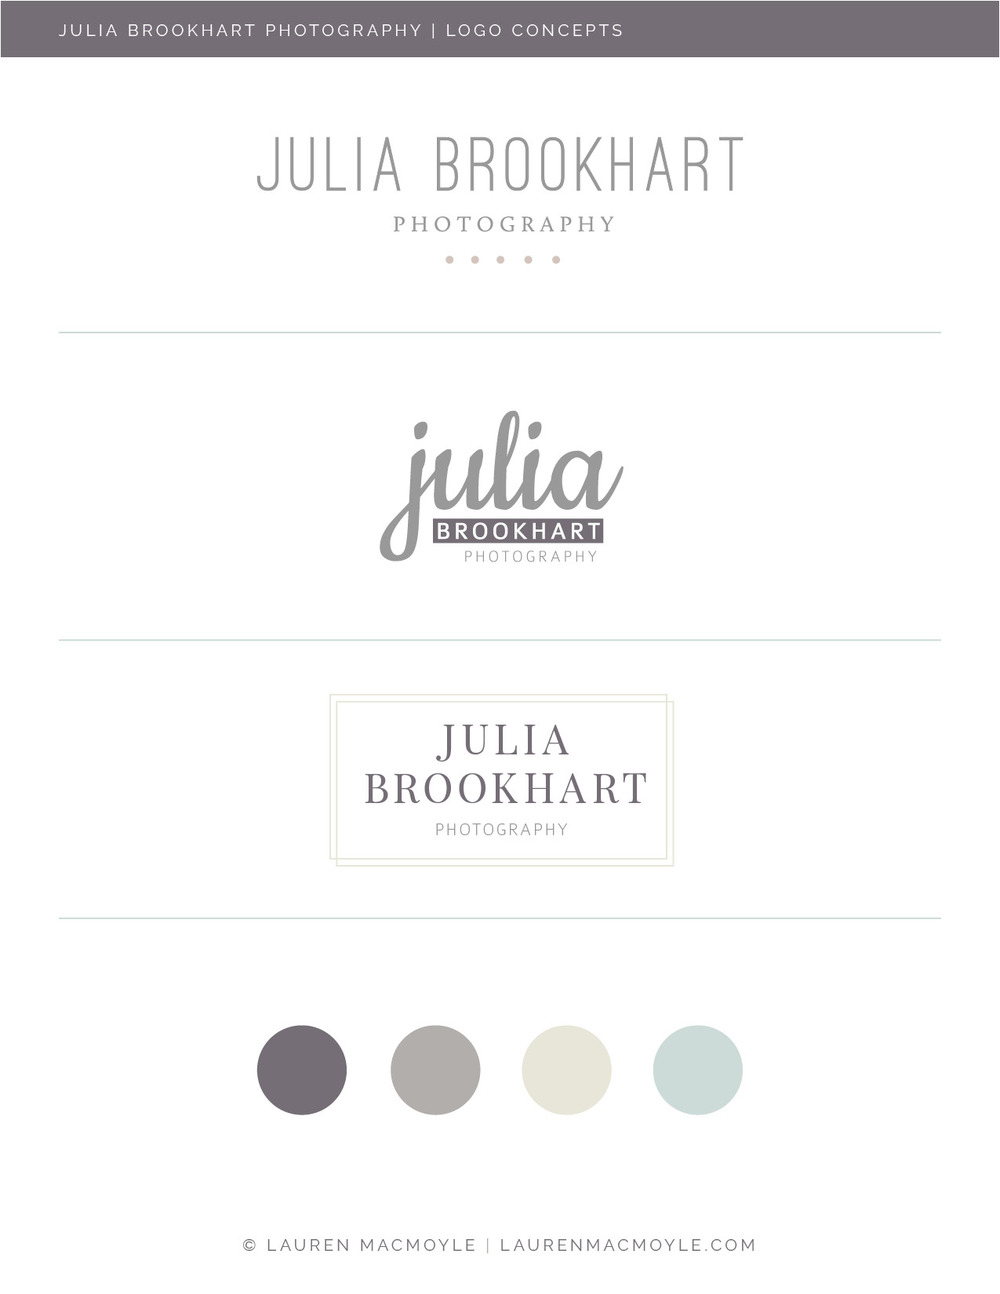 Studio Photography Branding and Logo Design | Lauren MacMoyle | Graphic Design